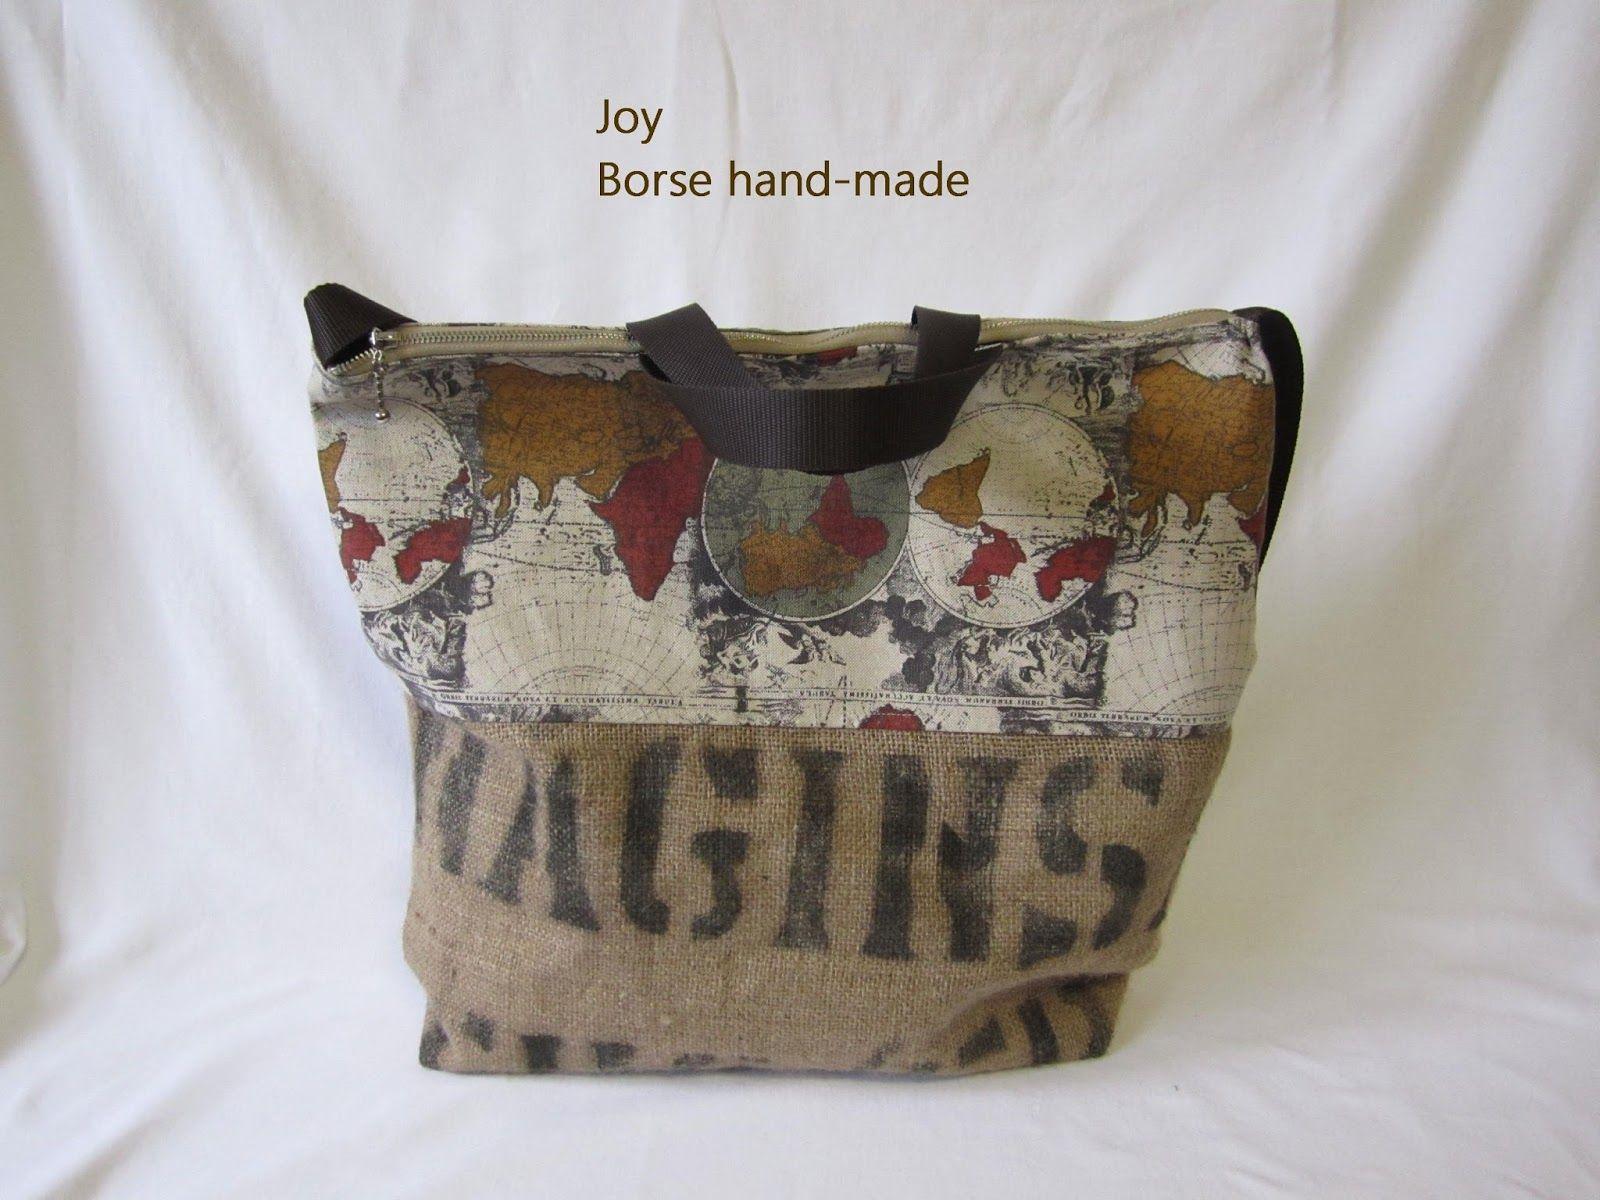 Joy Le Borse Hand made Recupero di sacco di juta n 2